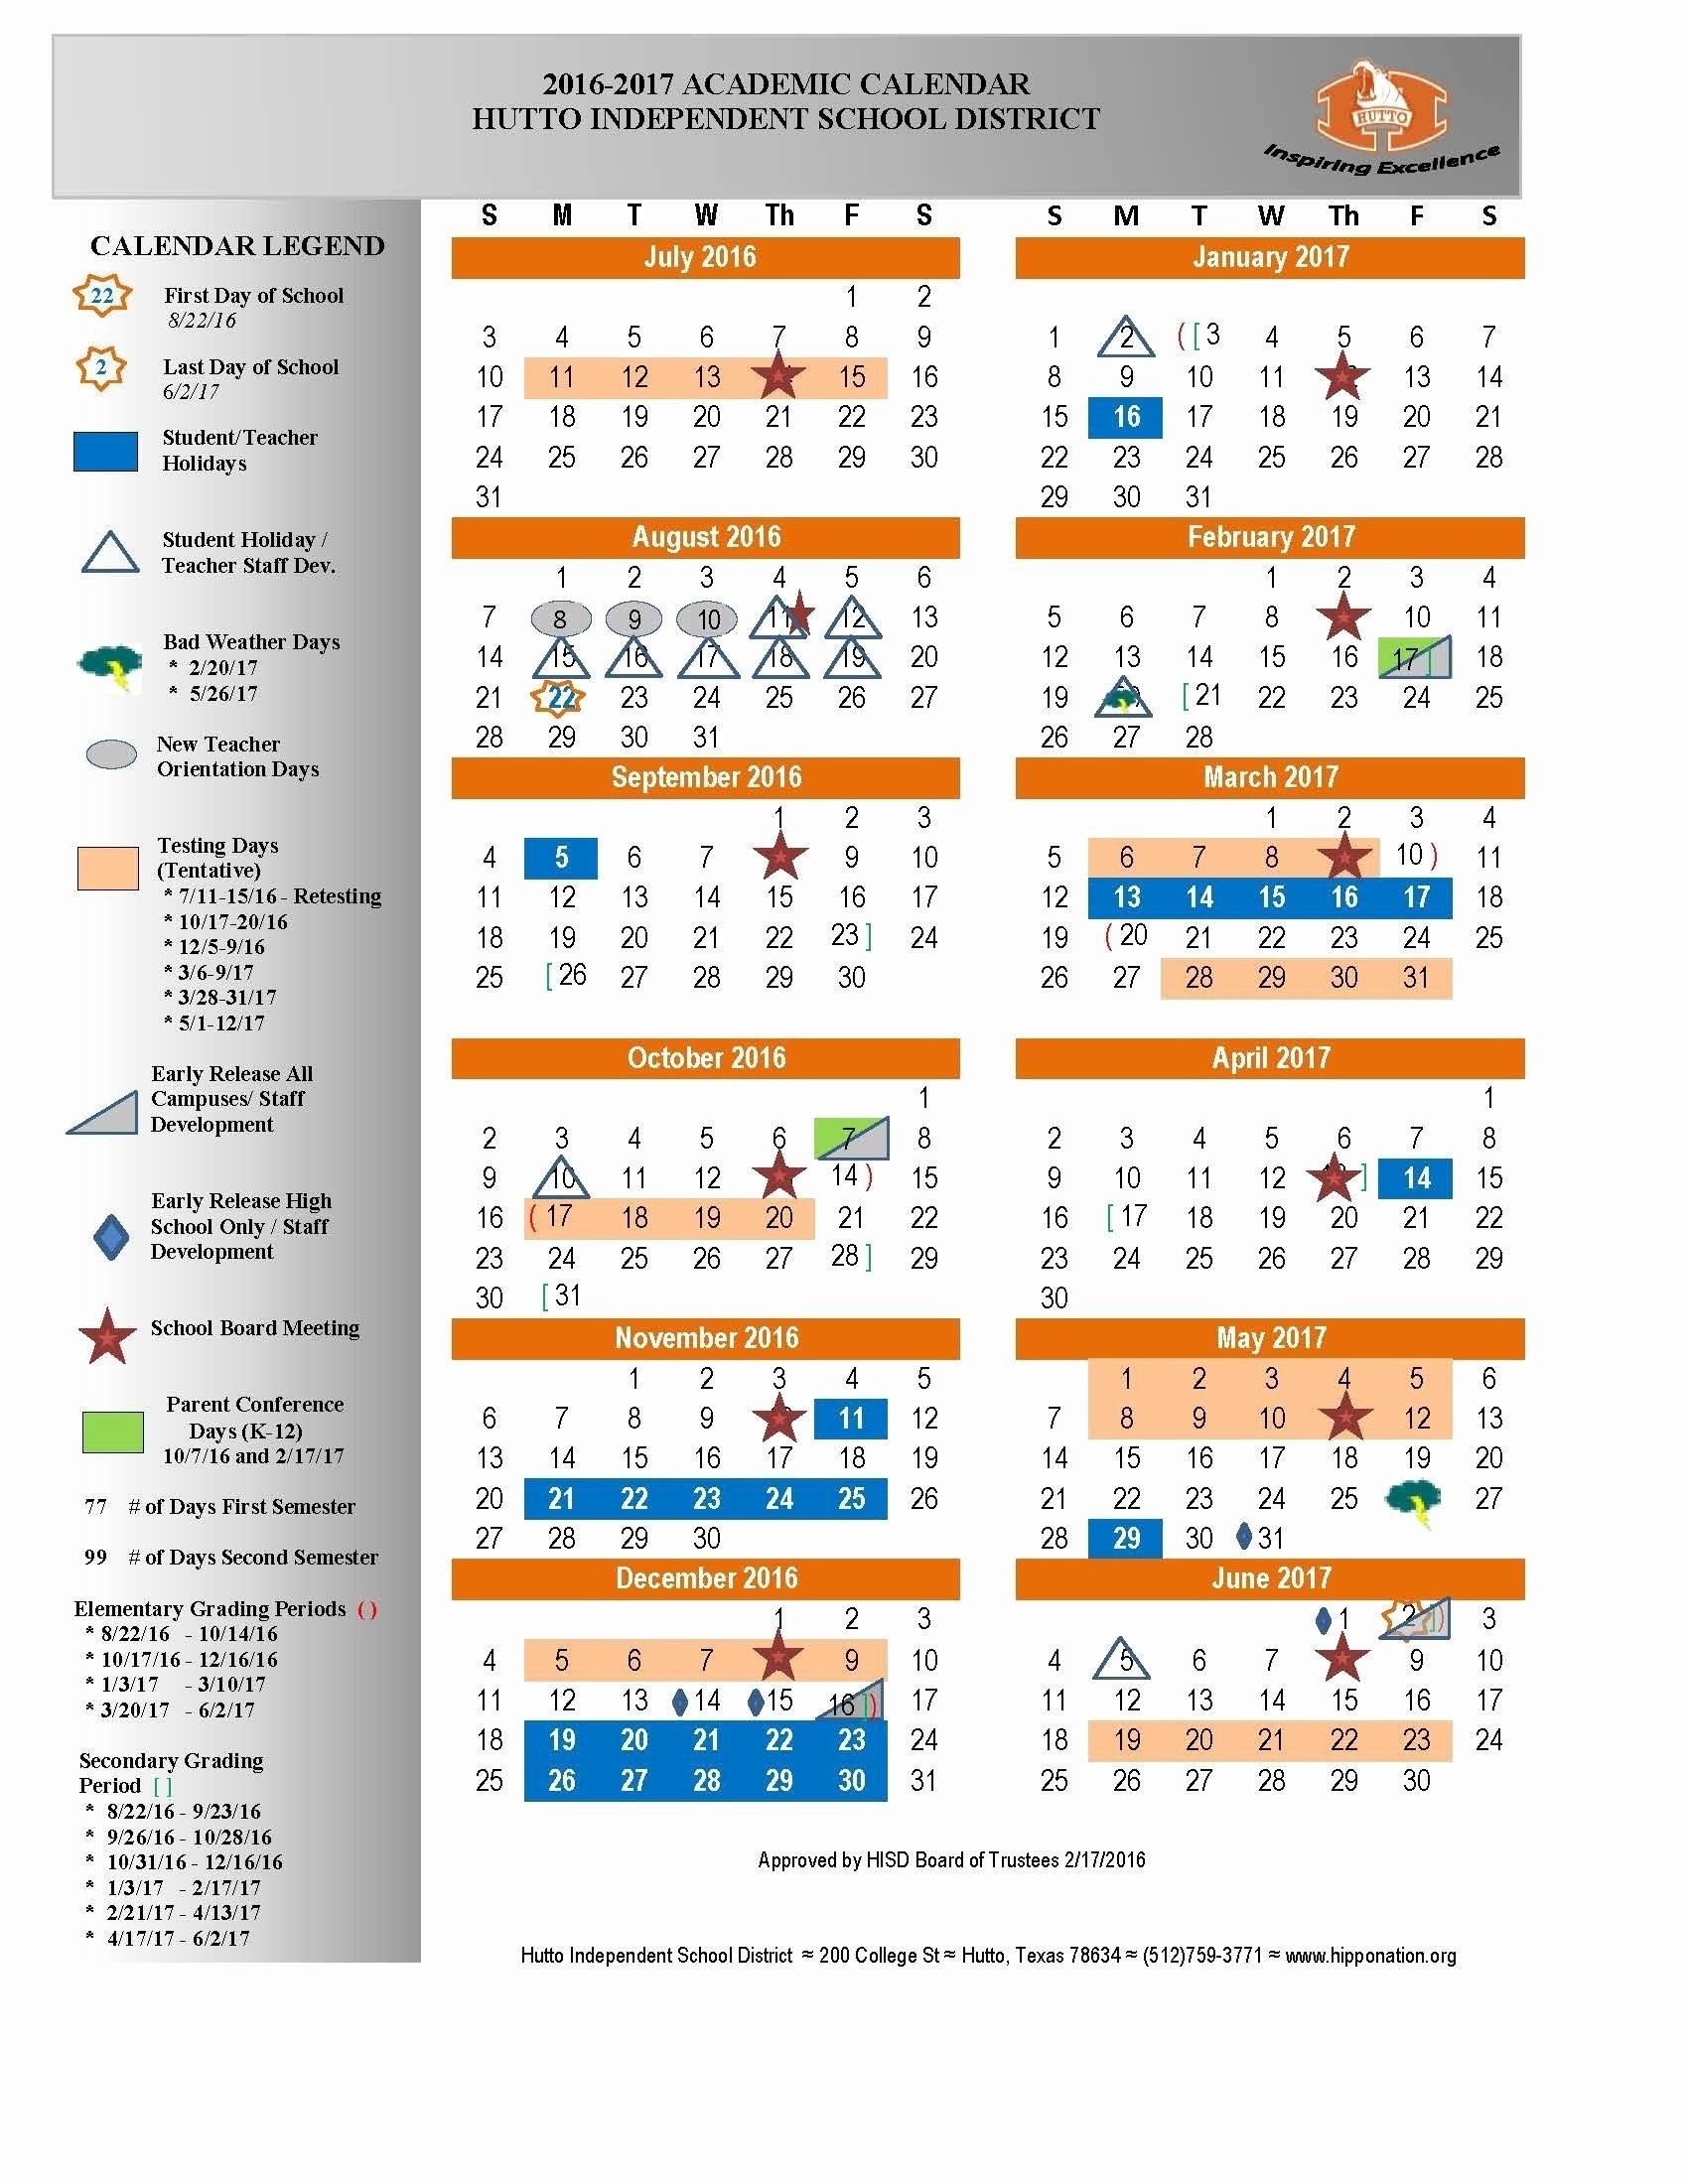 Hisd 2018 Calendar Hisd 2018 Calendar Hisd Calendar 2017 2016 Calendar 2019 Hisd